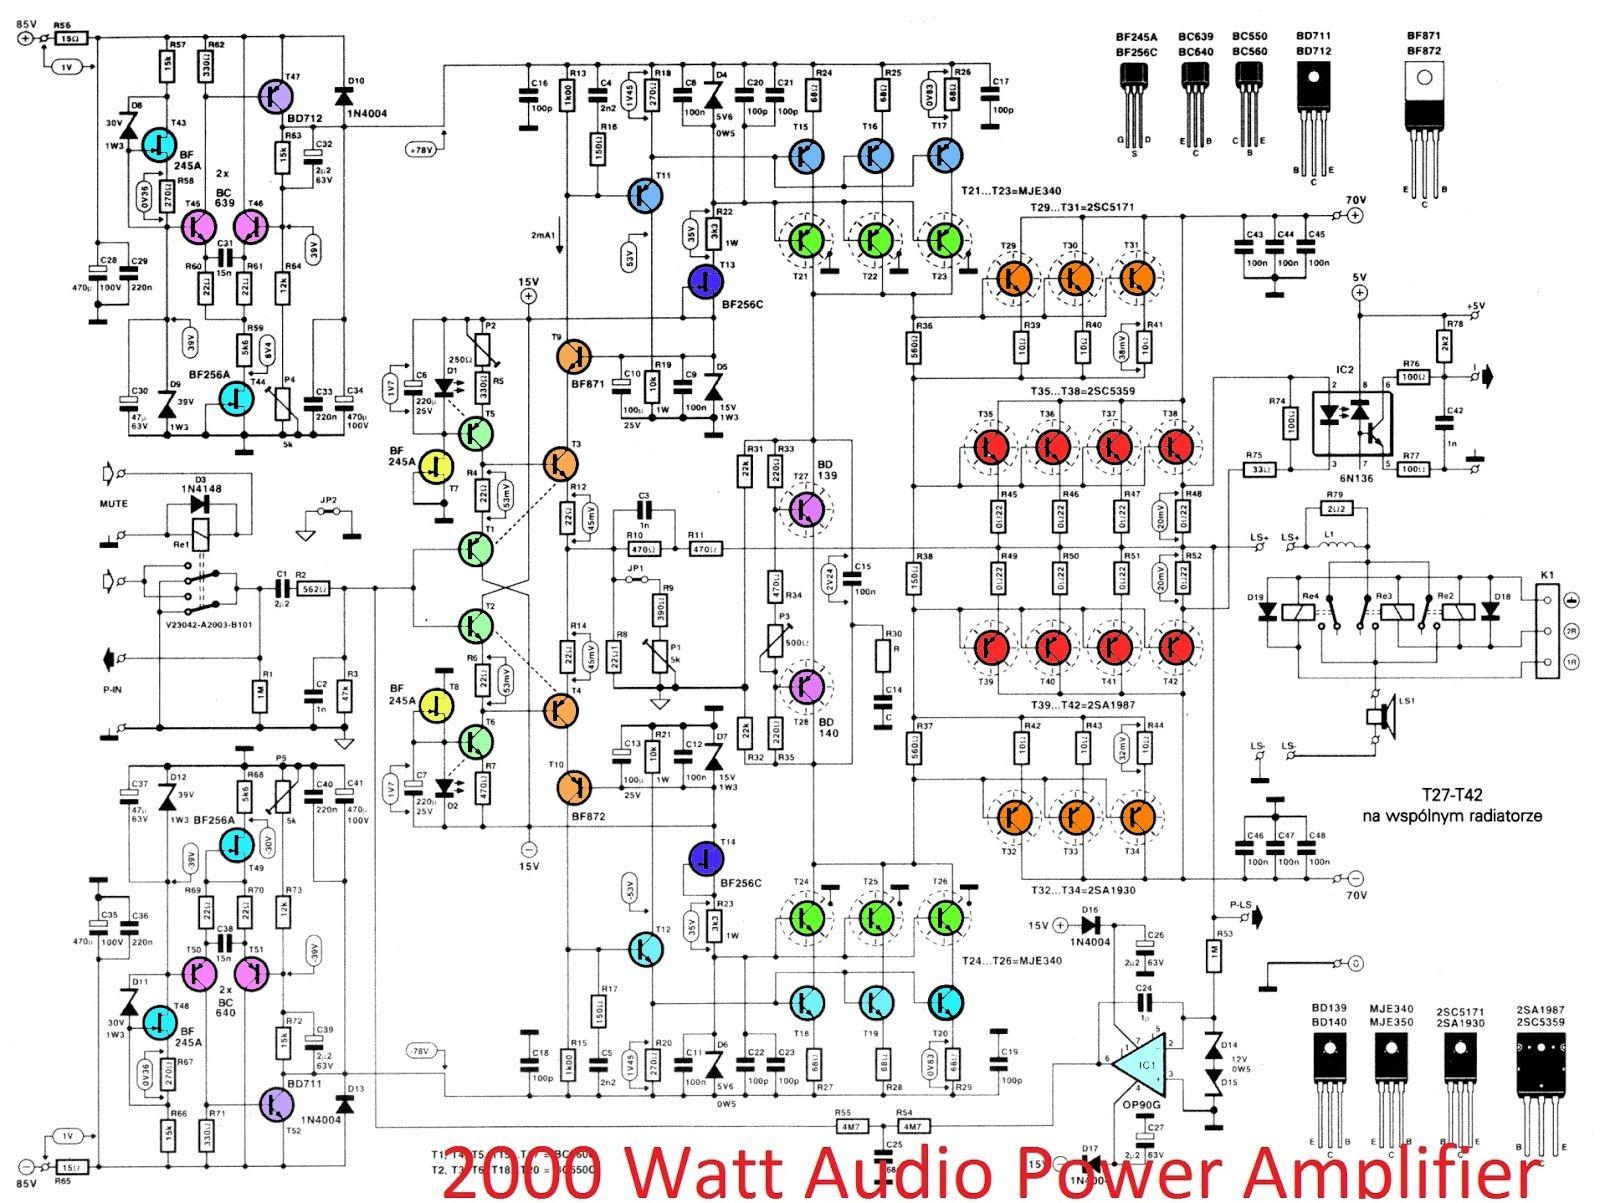 Car Power Amplifier Circuit Diagram 2000w High Power Amplifier 2sc5359 2sa1987